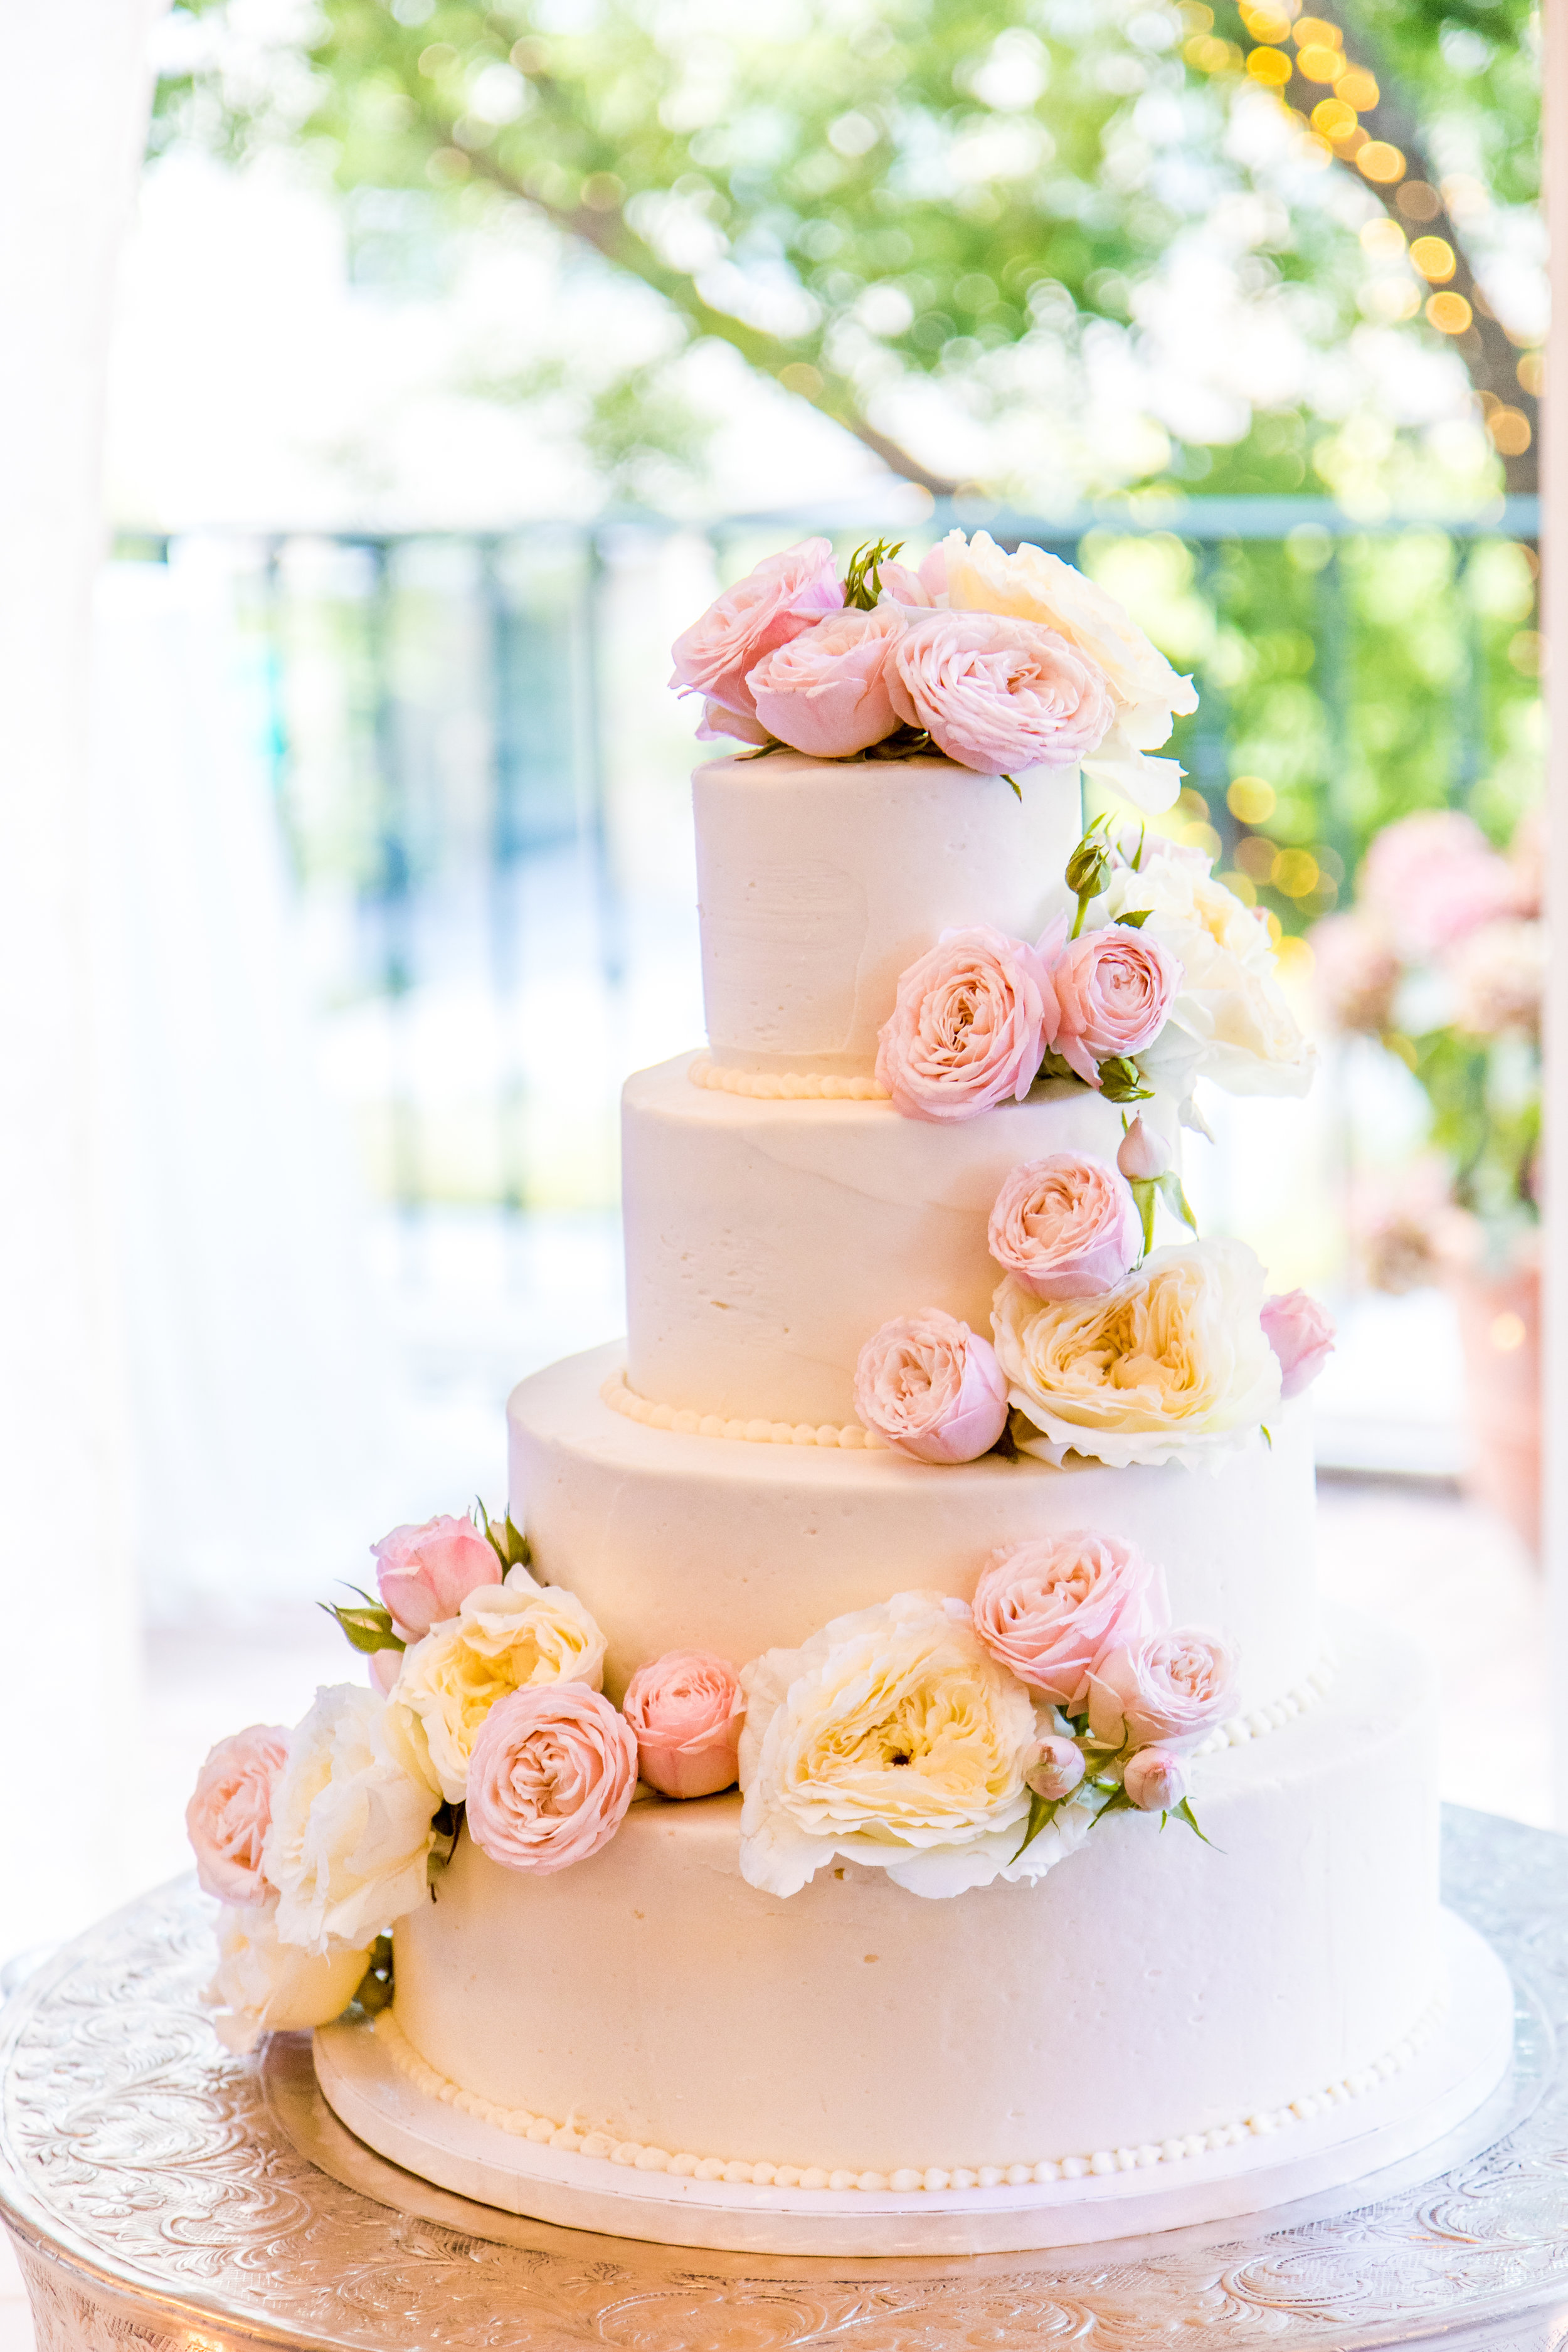 - CUSTOM GLUTEN FREE CAKES